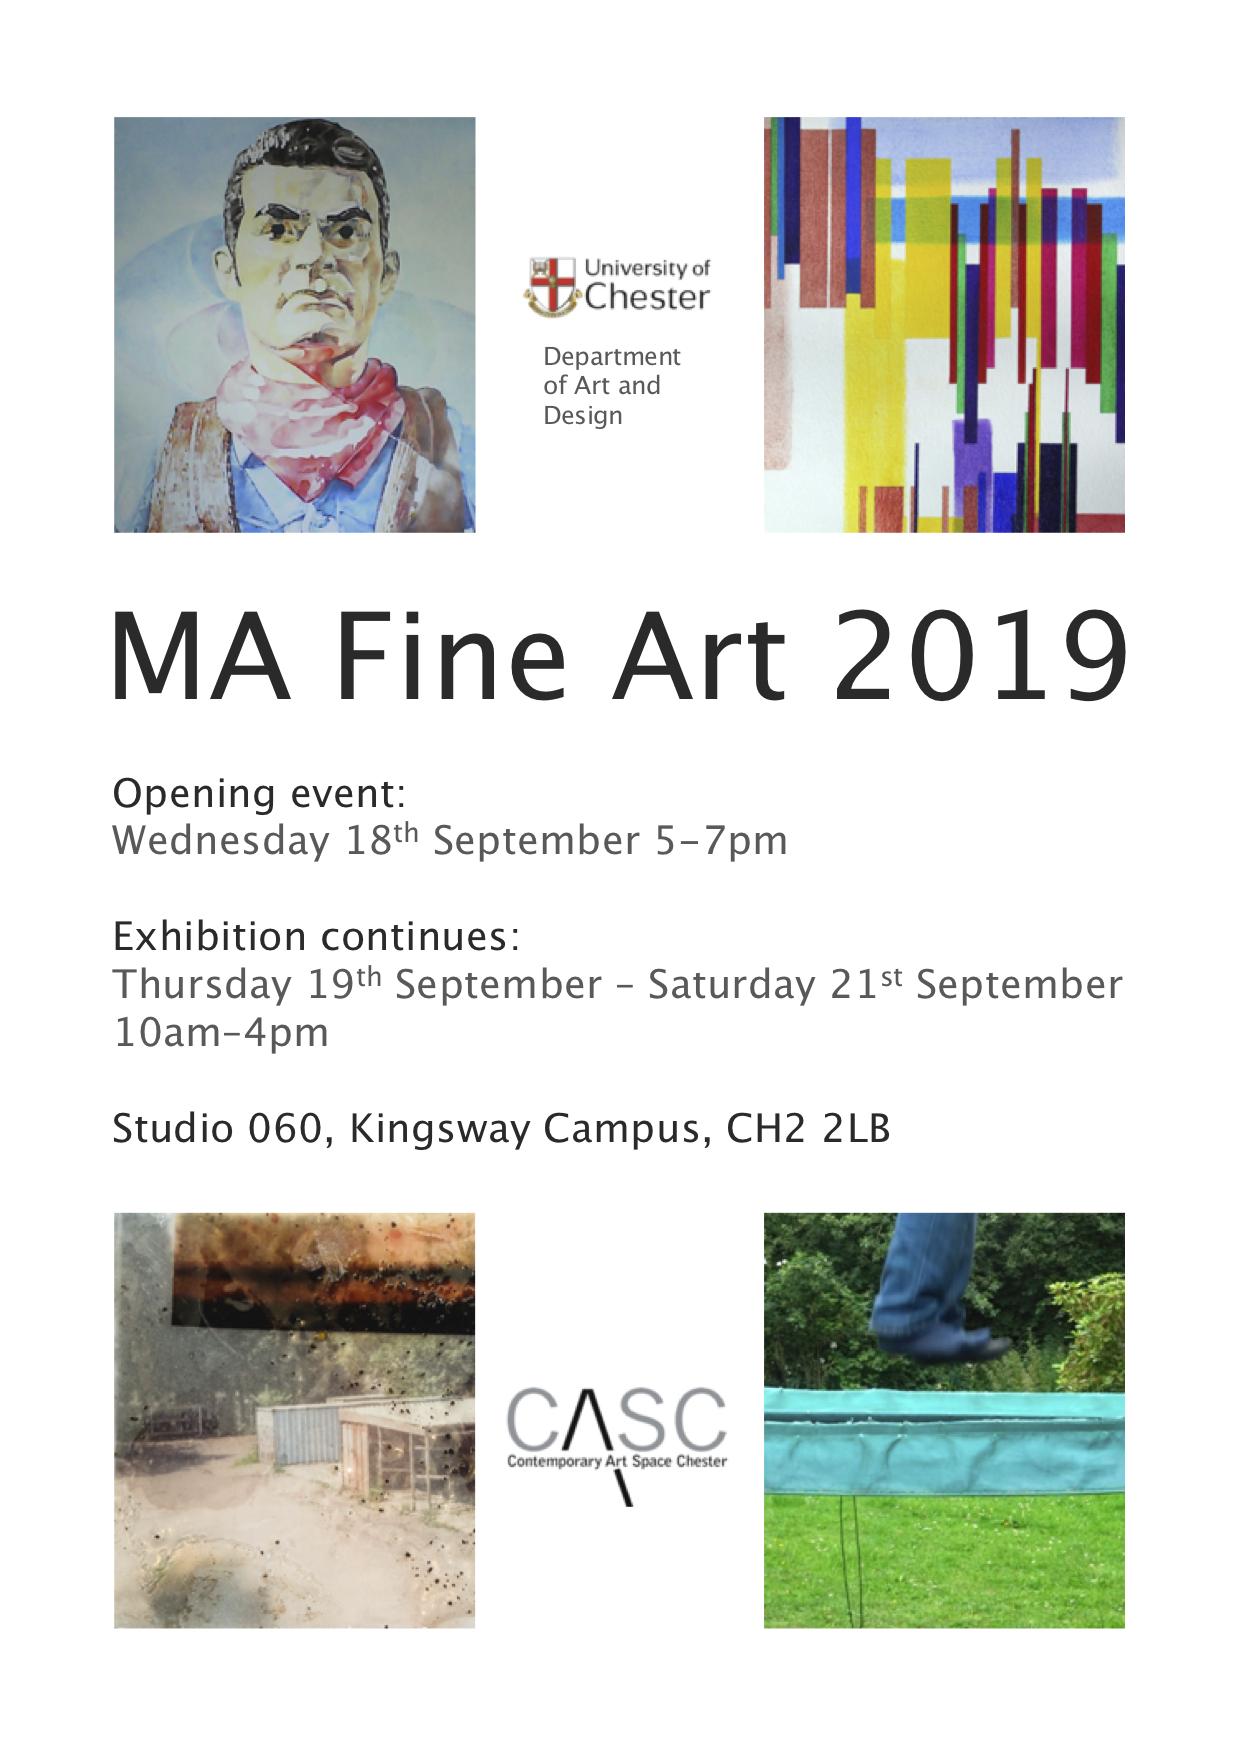 University of Chester: MA Fine Art Exhibition 2019